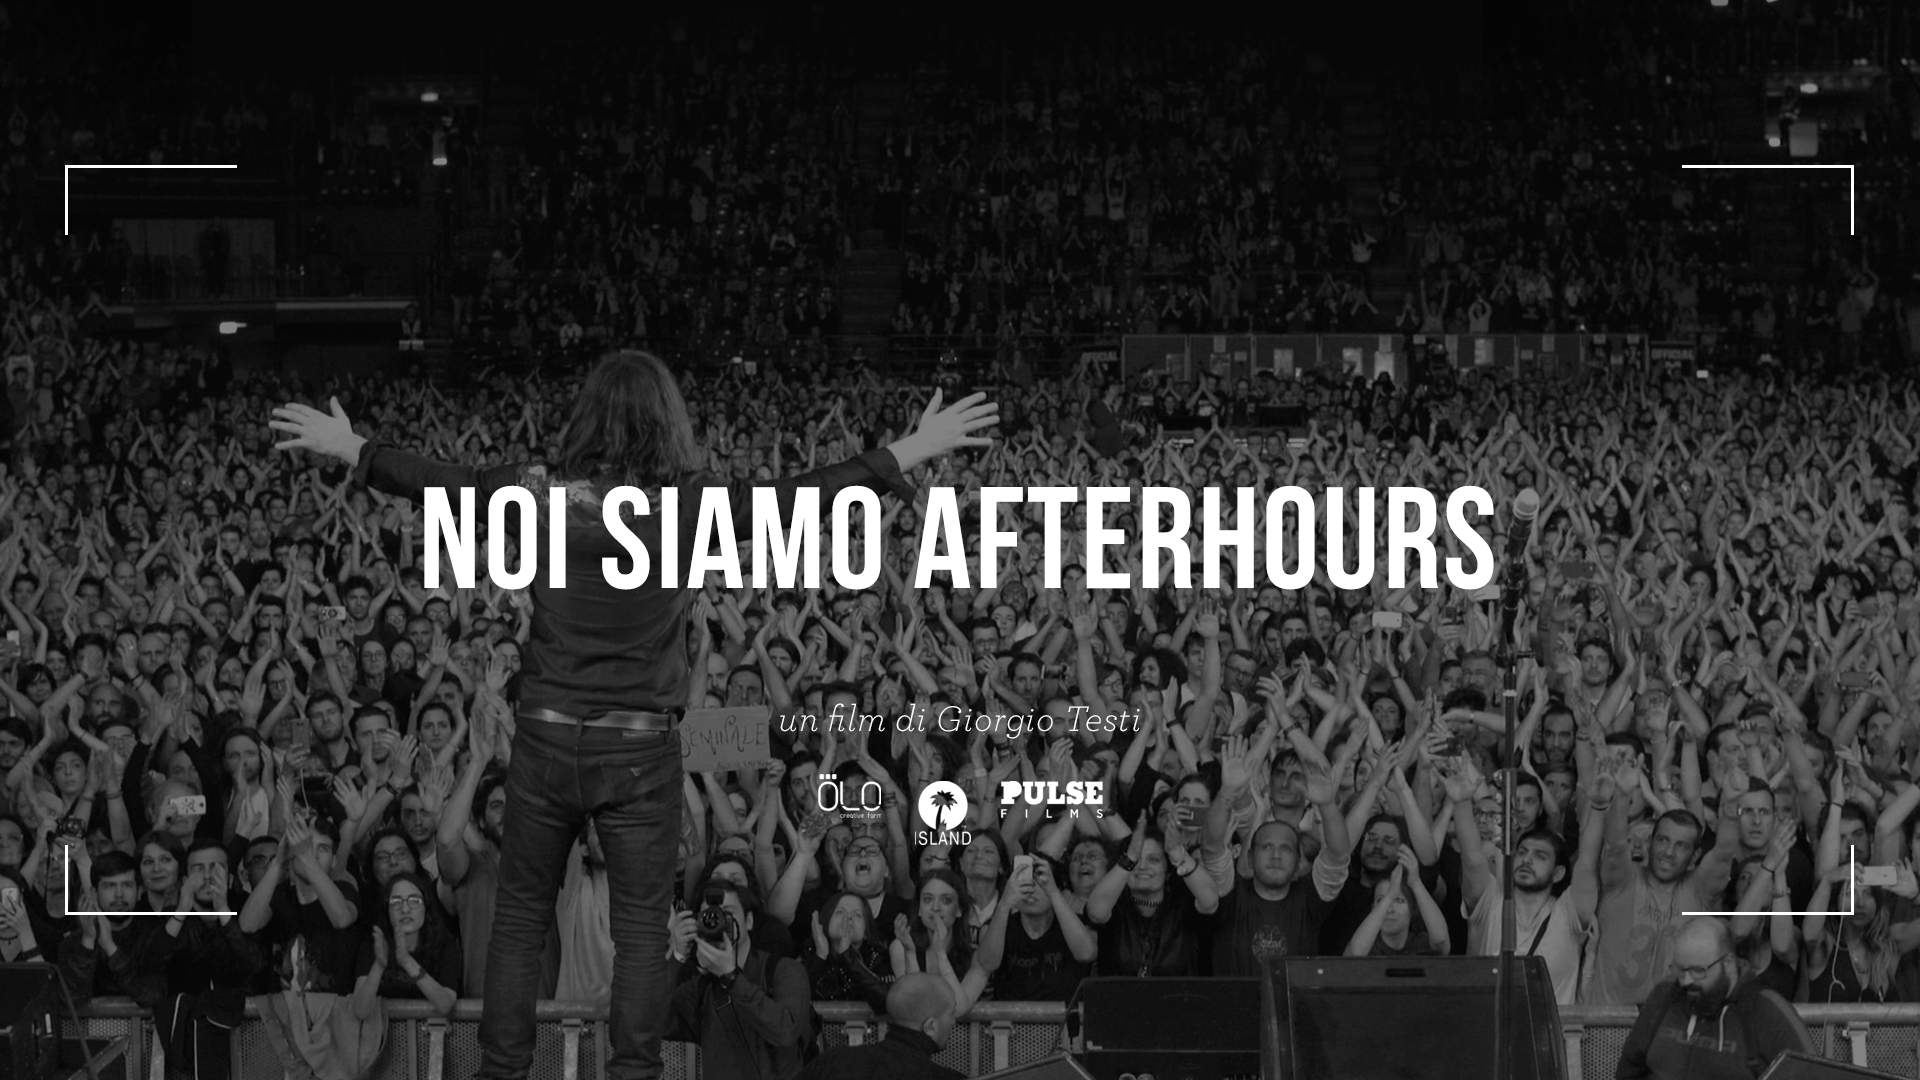 Afterhours Noi siamo Afterhours